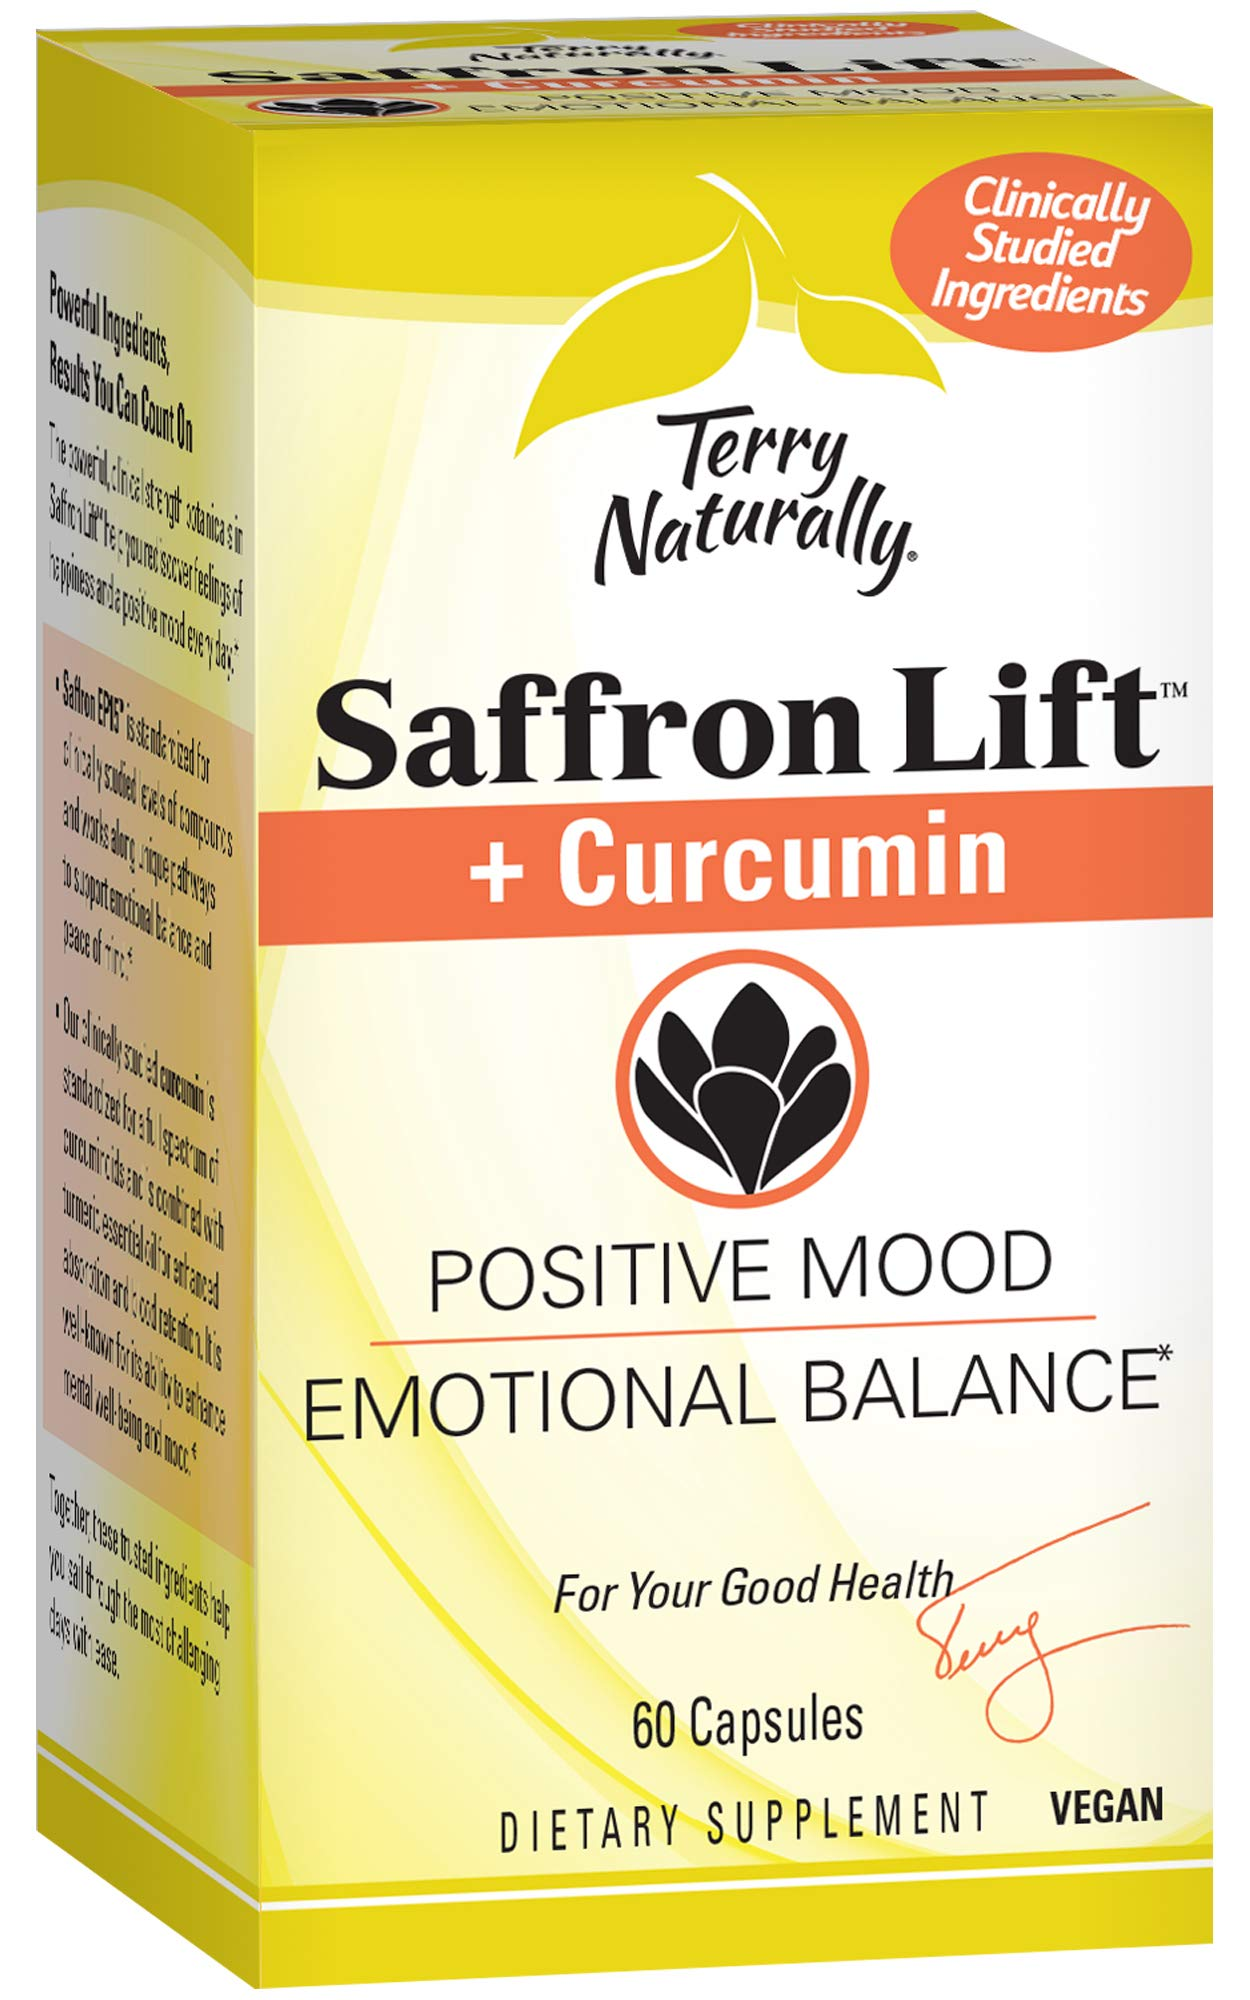 Terry Naturally Saffron Lift Plus Curcumin 60 Capsules